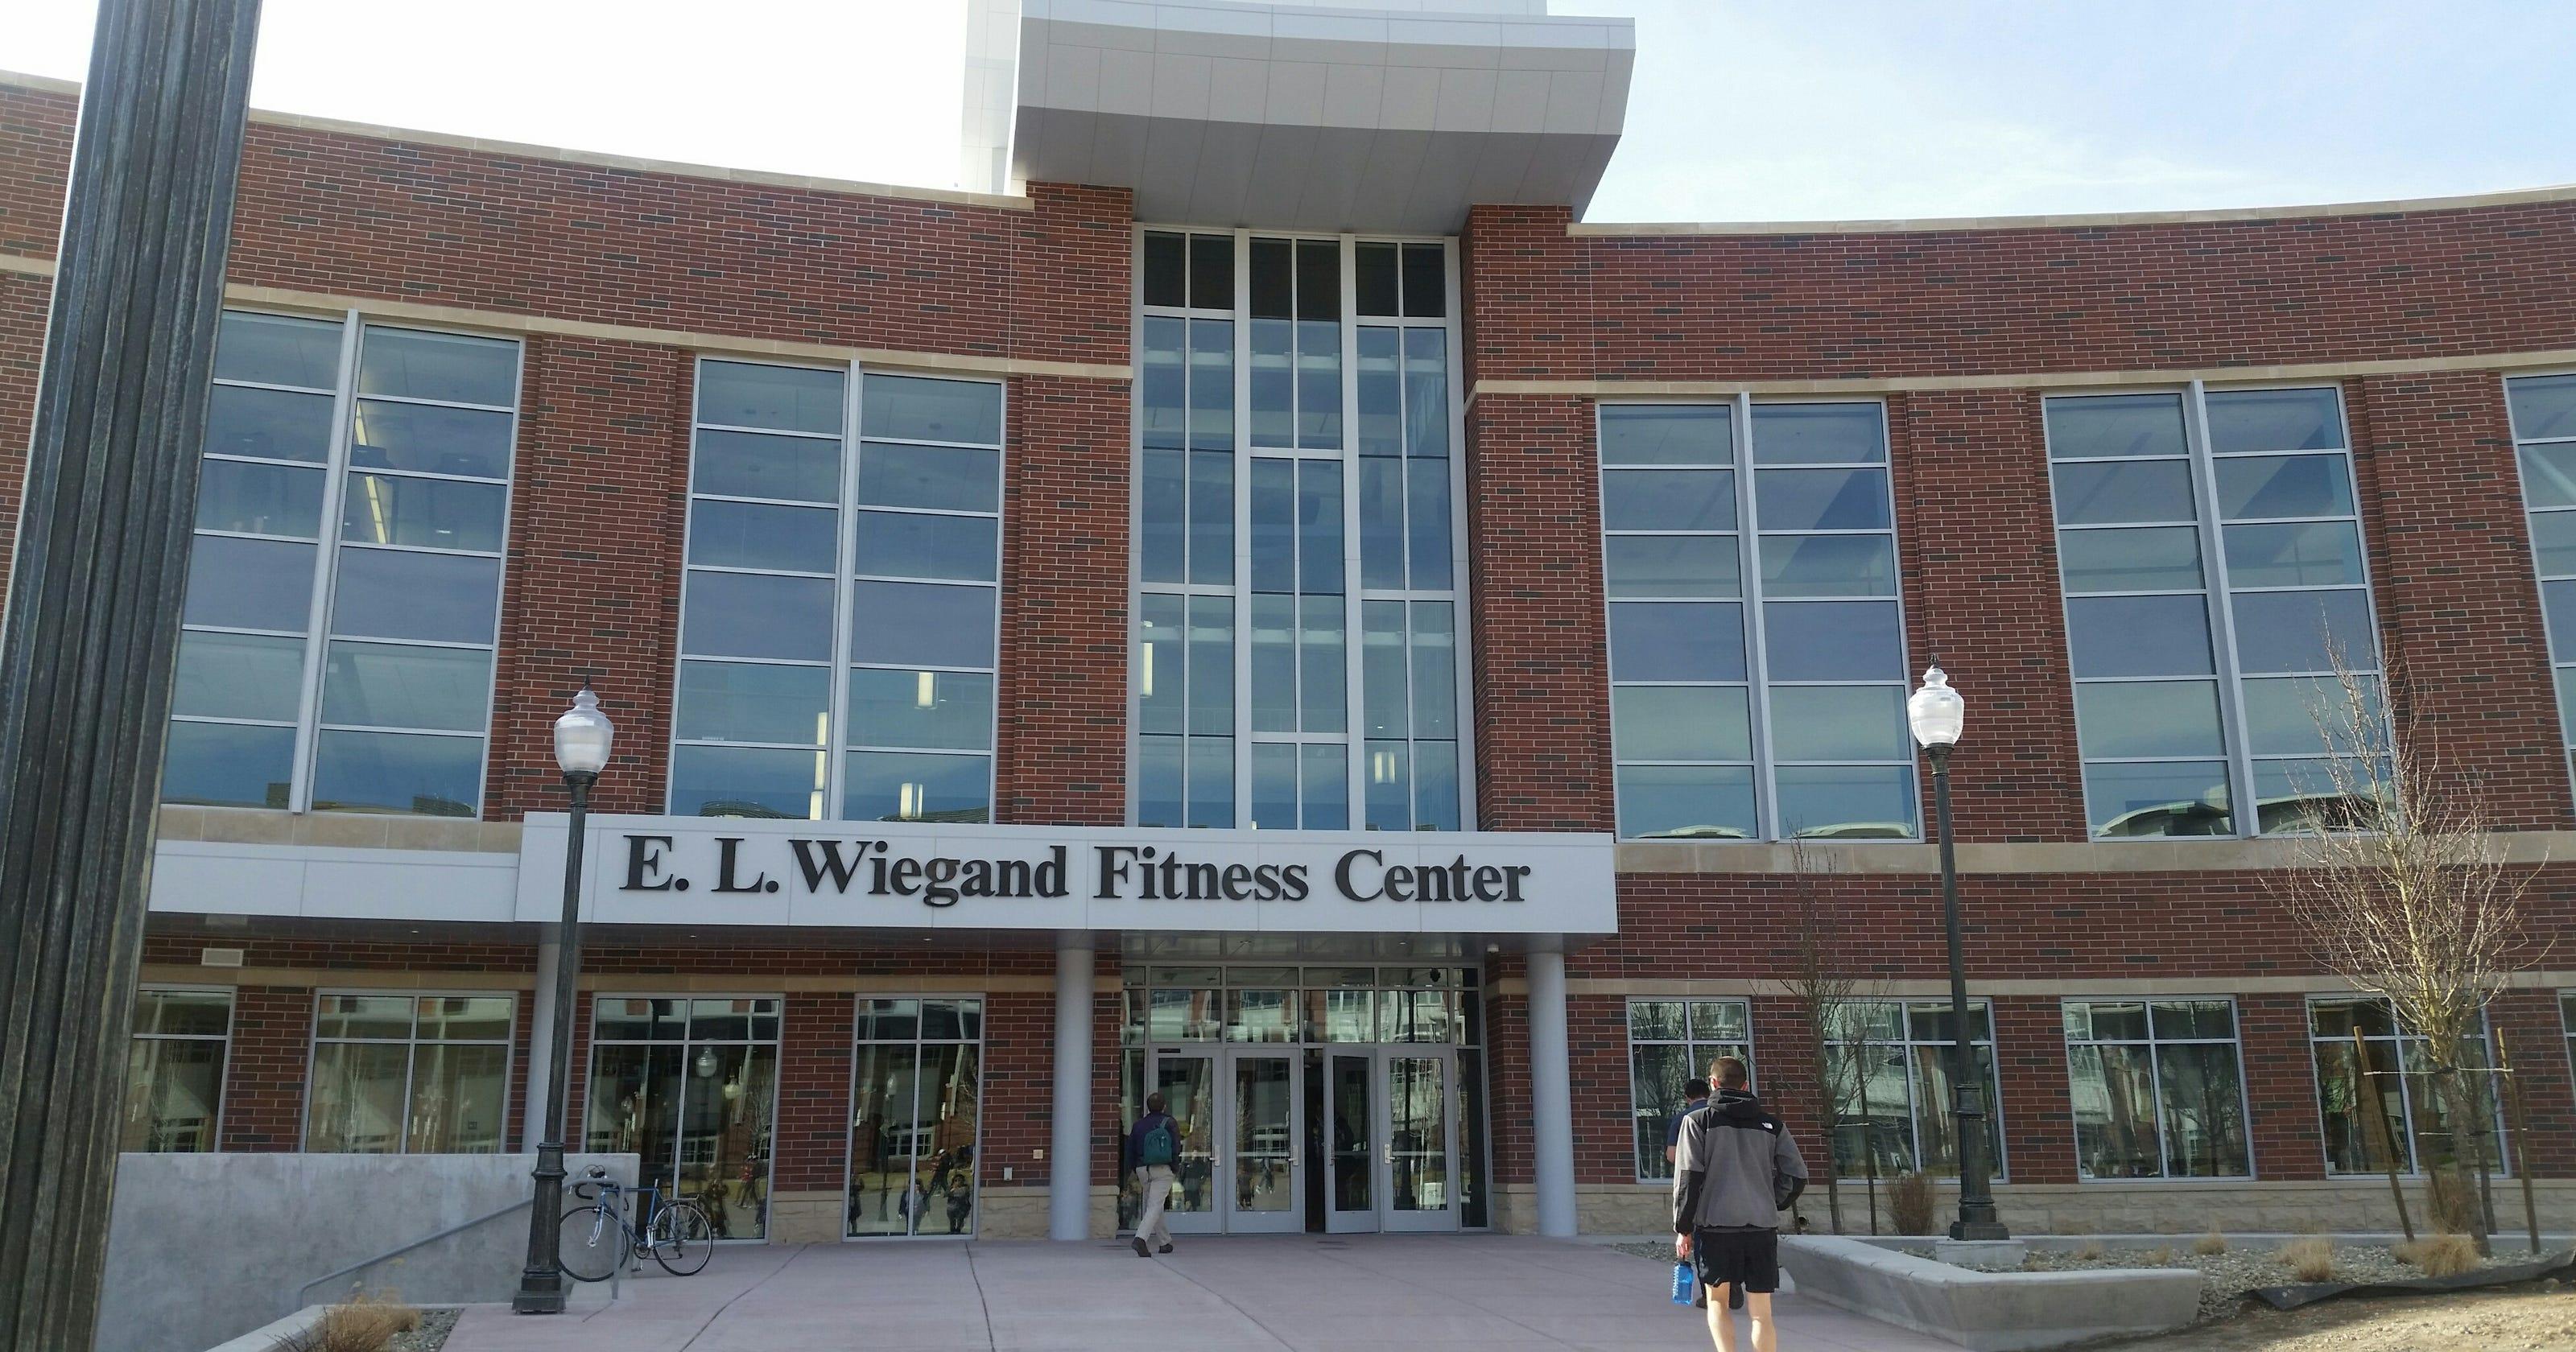 UNR Opens 475 Million Fitness Center